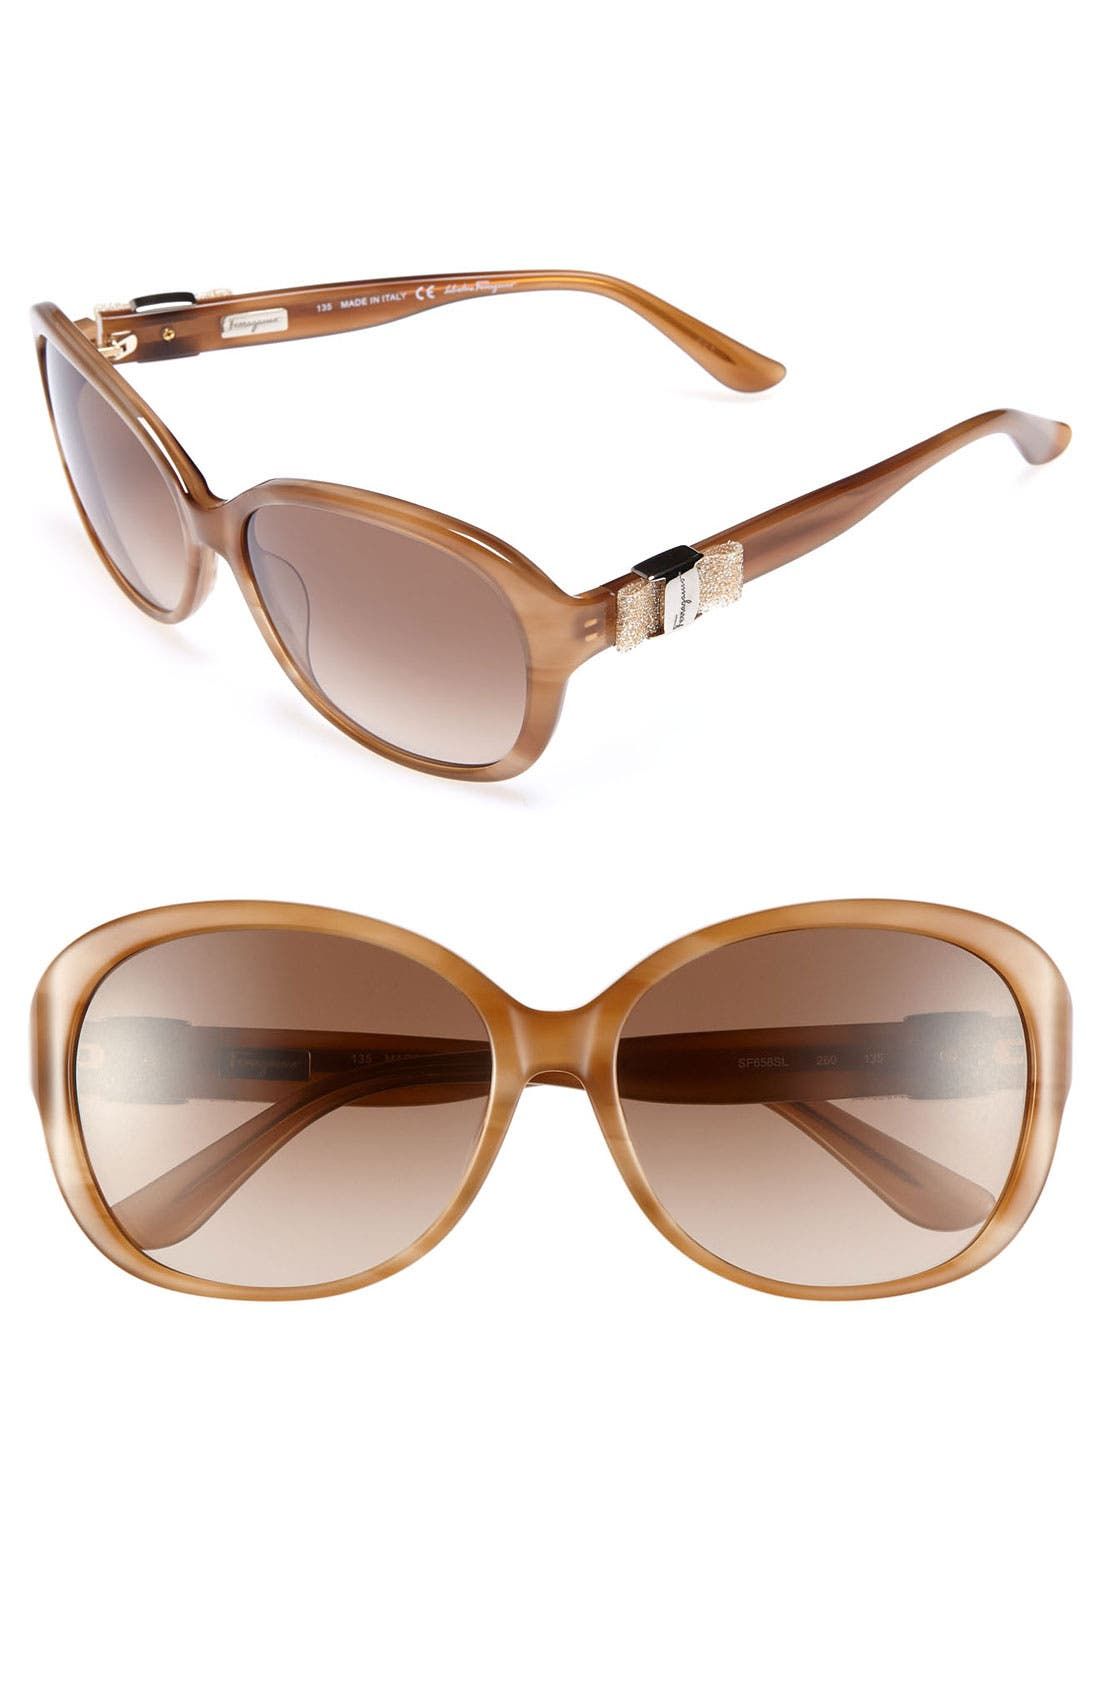 Alternate Image 1 Selected - Salvatore Ferragamo Oversized Sunglasses